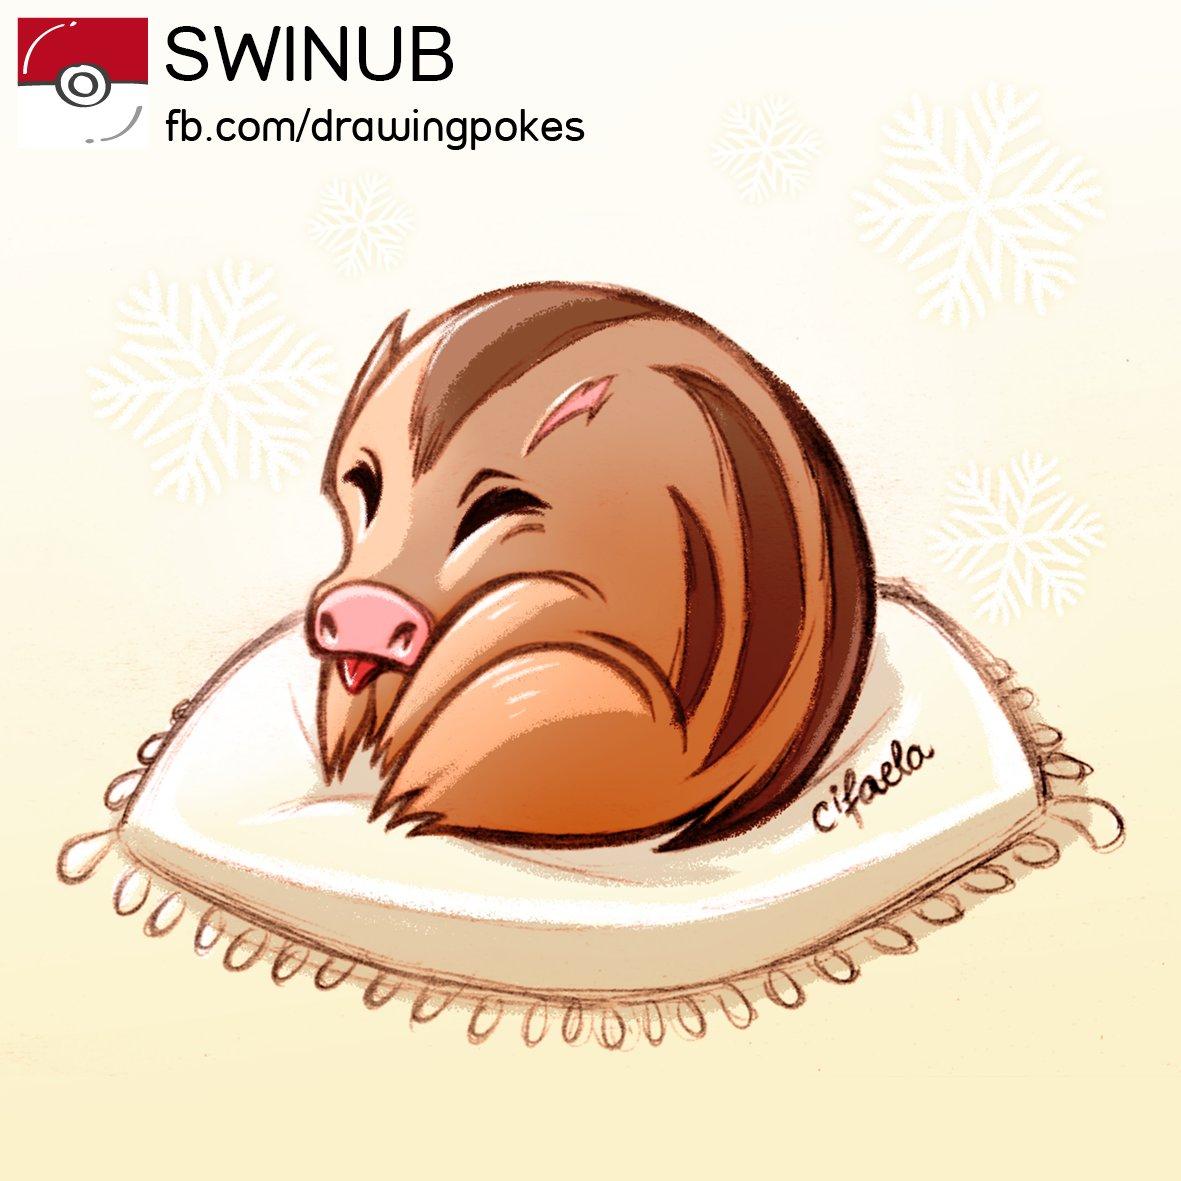 Fabiola monteiro swinubl